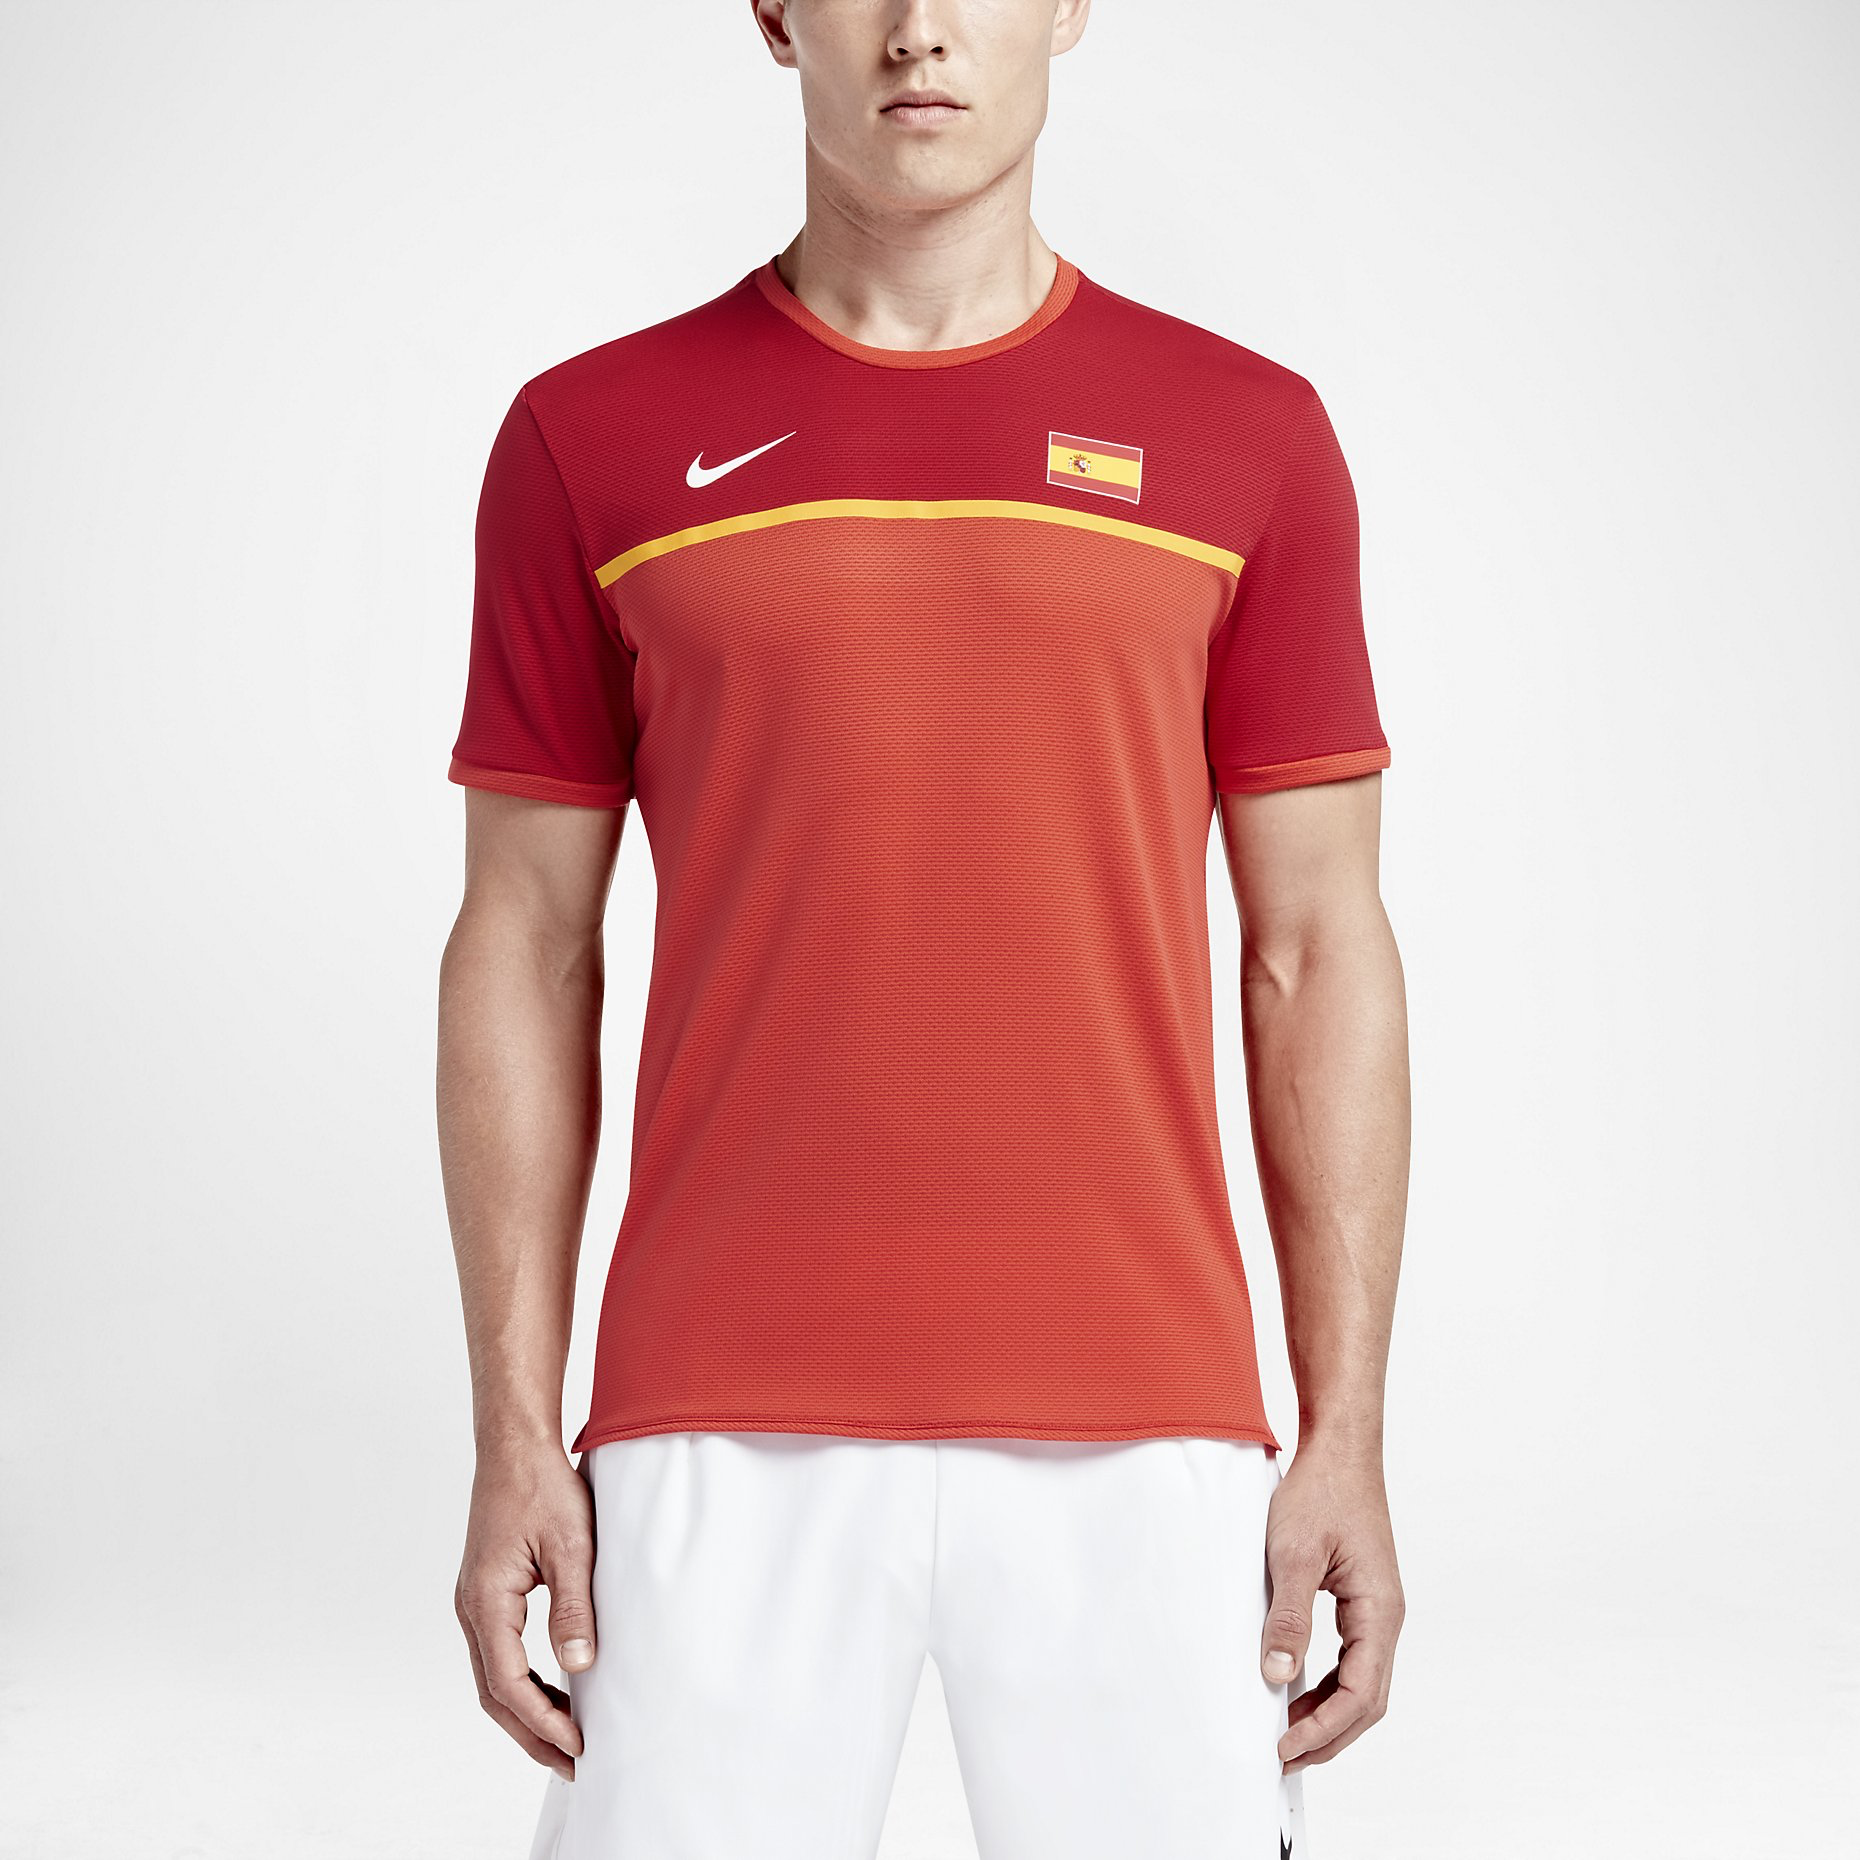 Nike Court AeroReact Rafael Nadal Challenger Mens Tennis Shirt M Red 802209  696